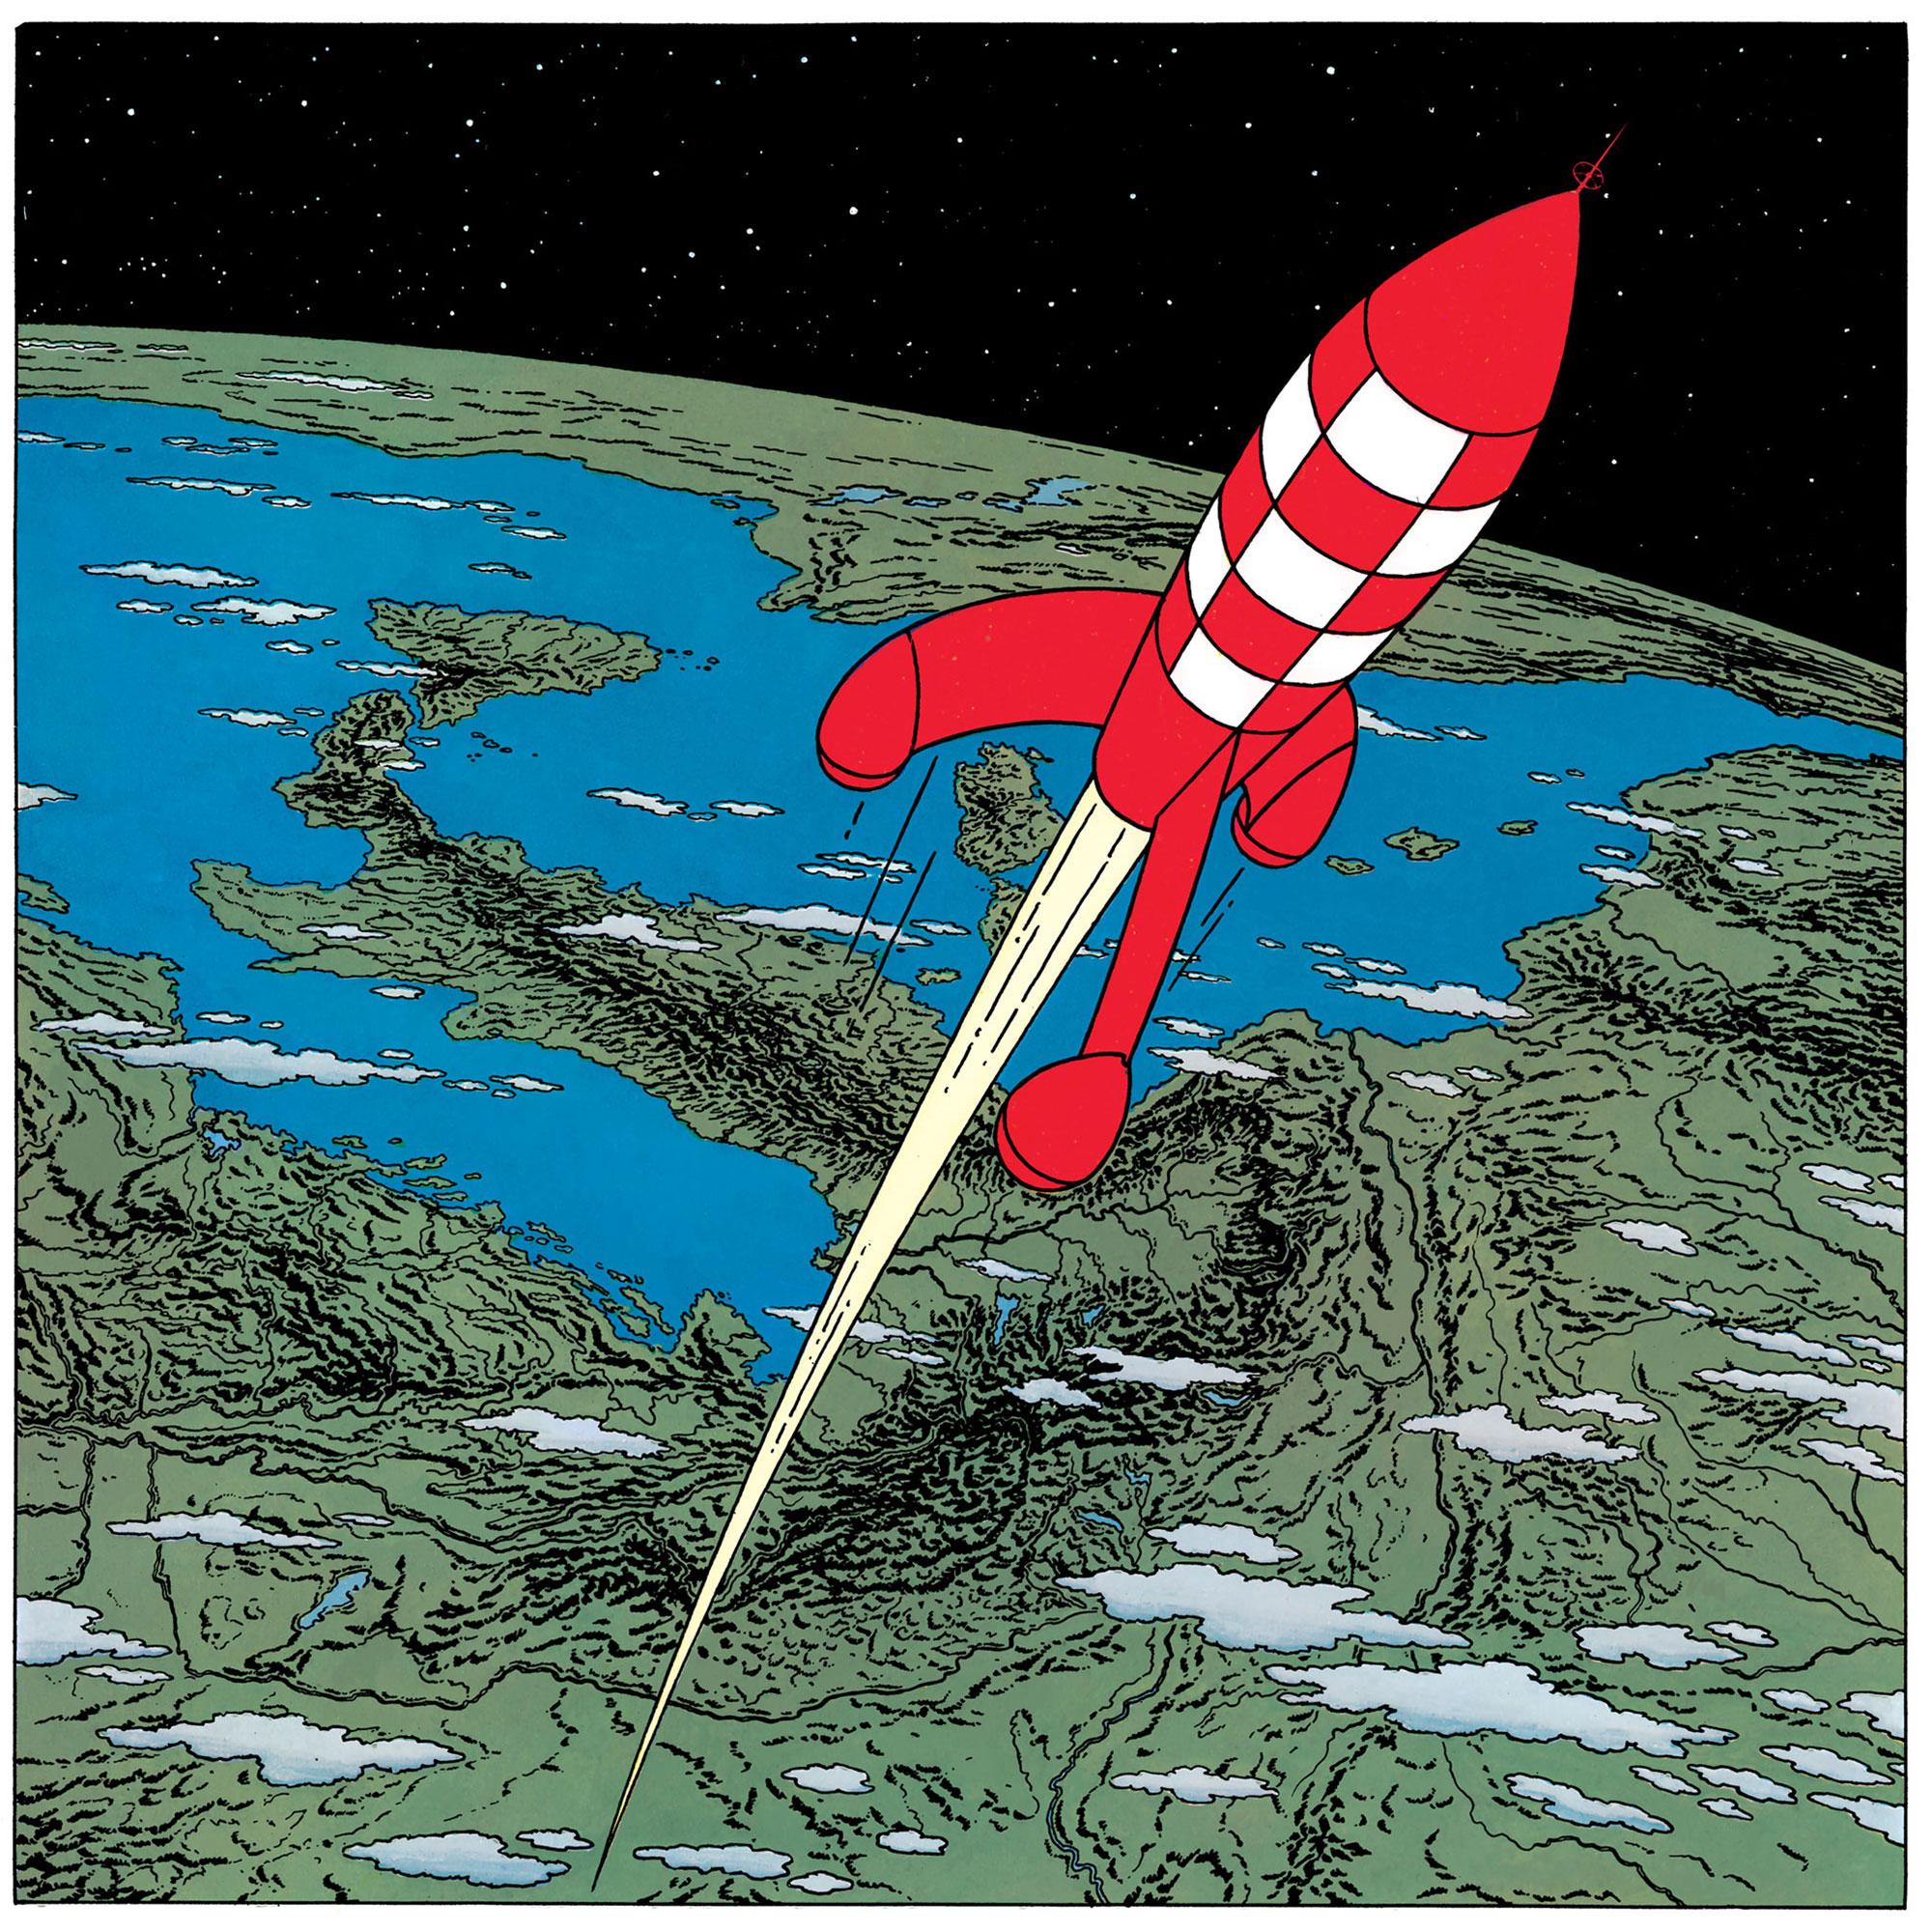 Rocket in Destination Moon